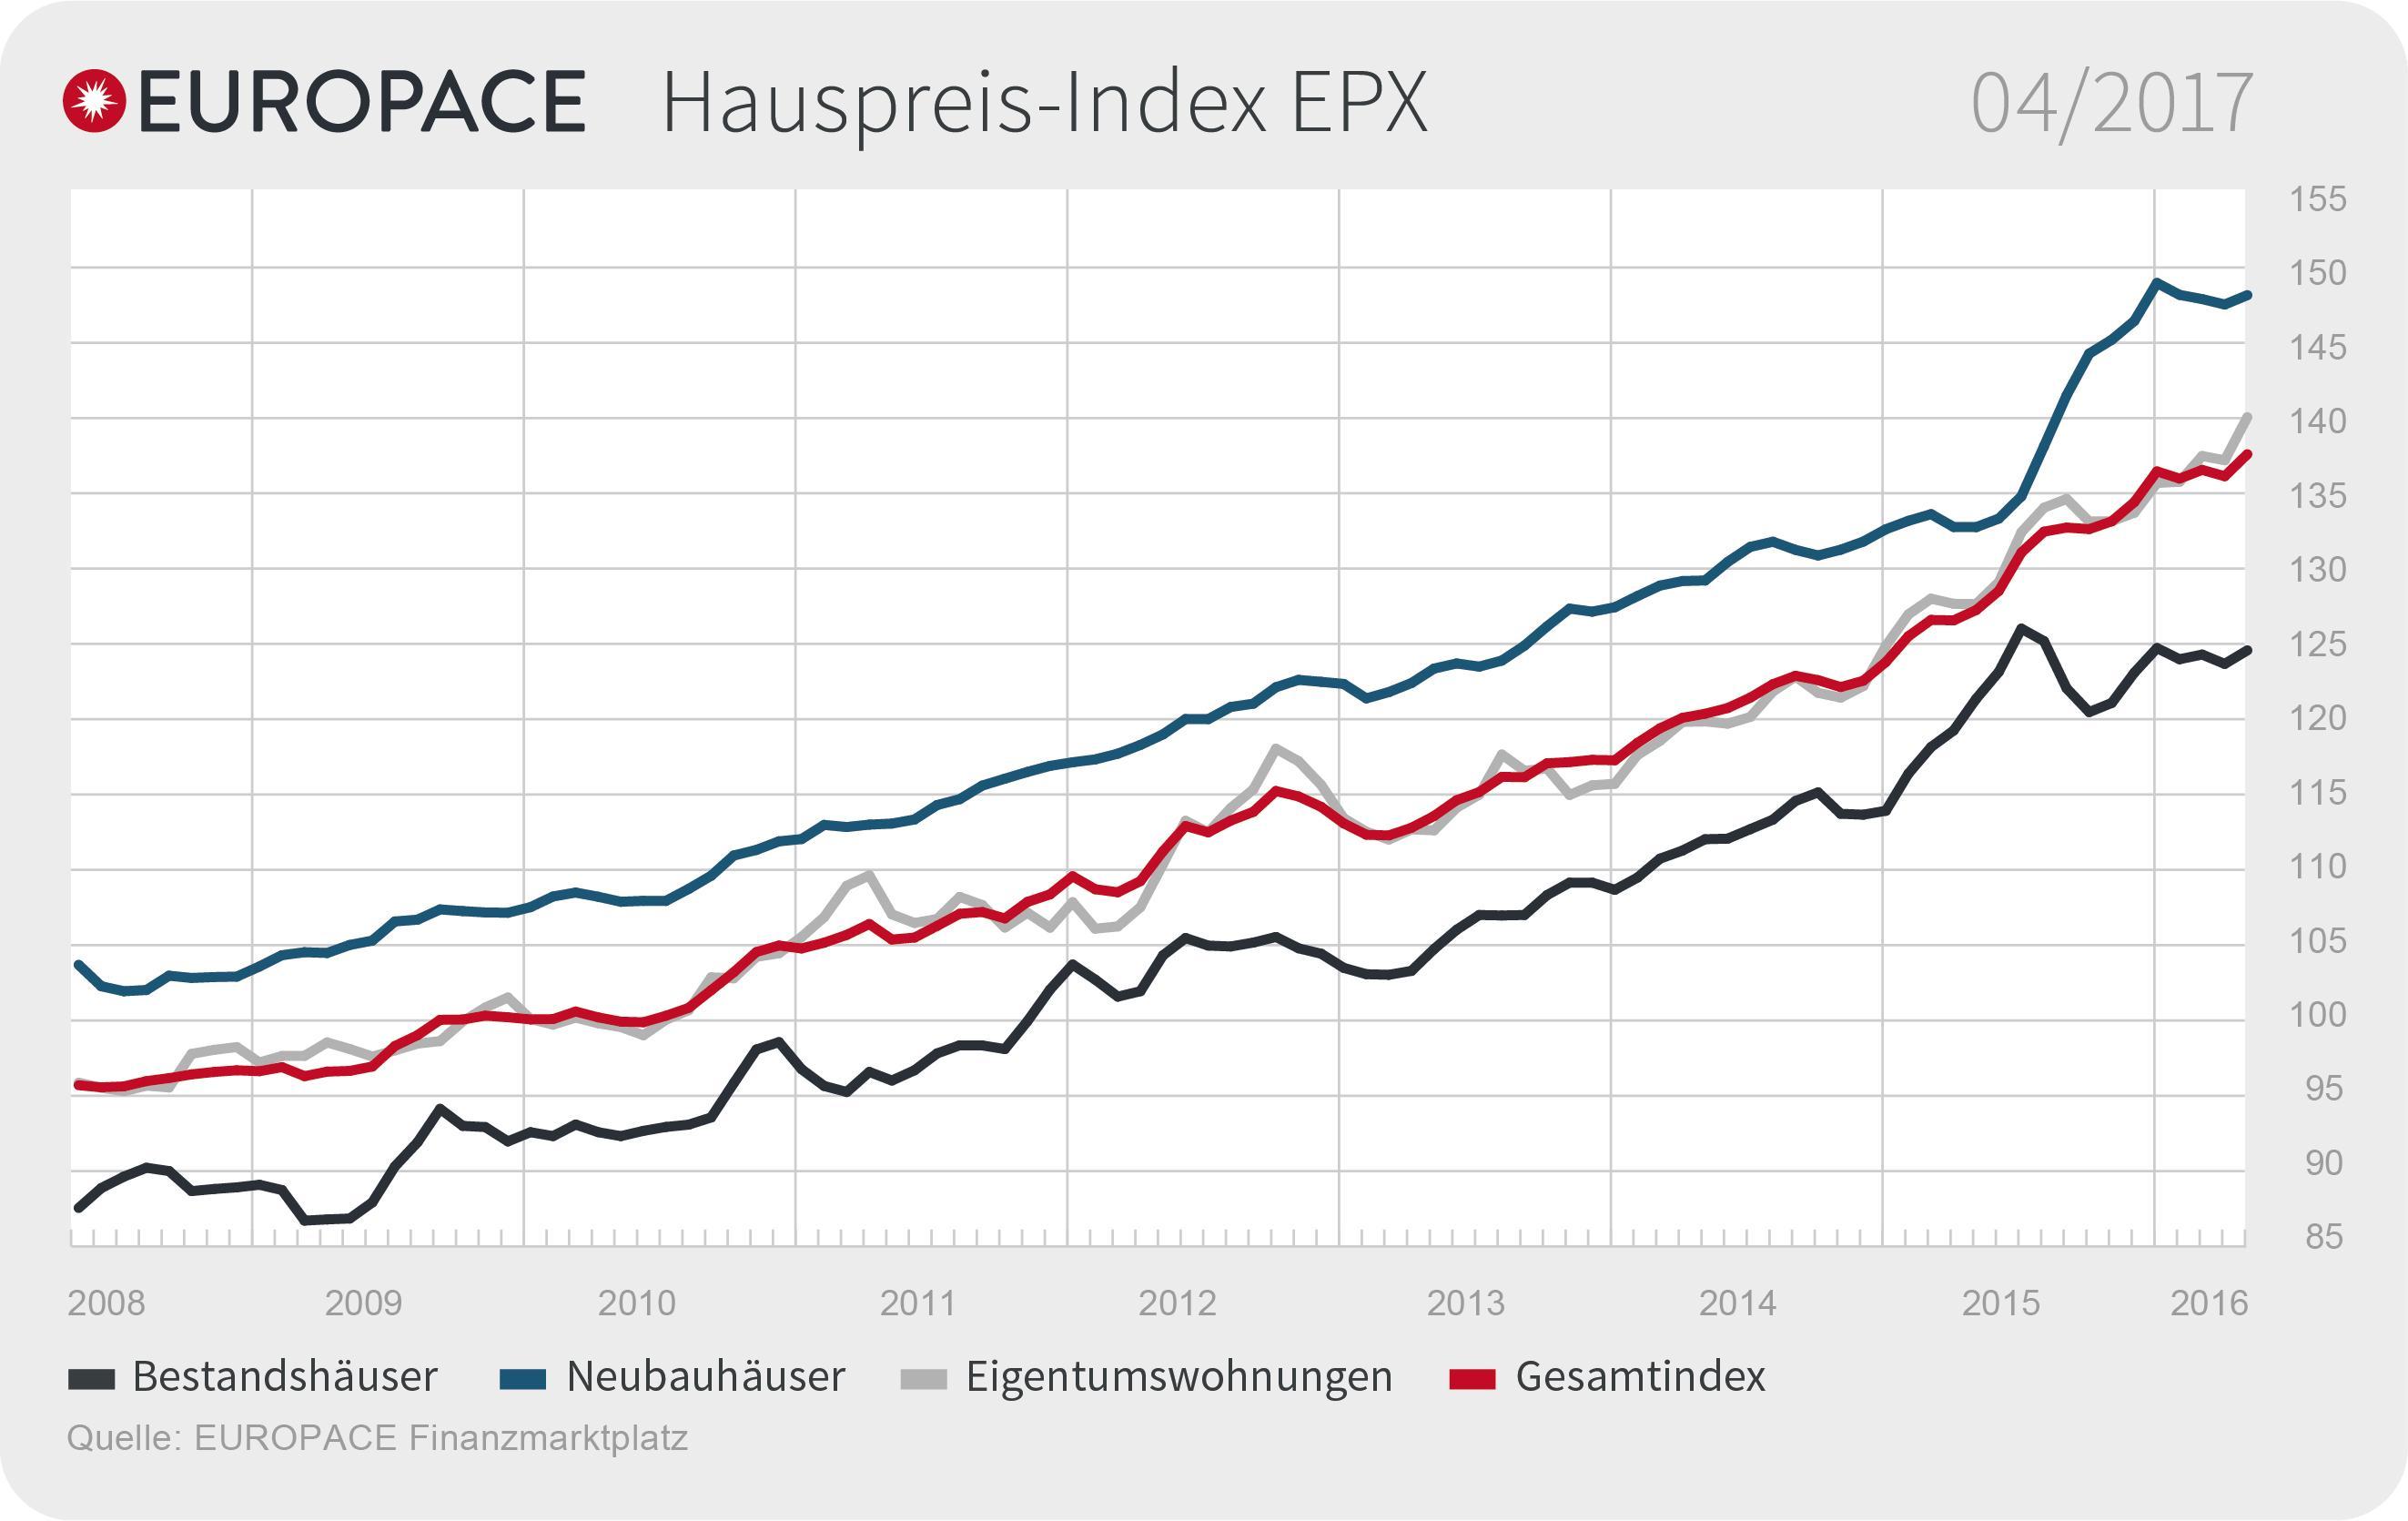 Epx April 2017 De in Wohnimmobilienpreise steigen in allen Segmenten